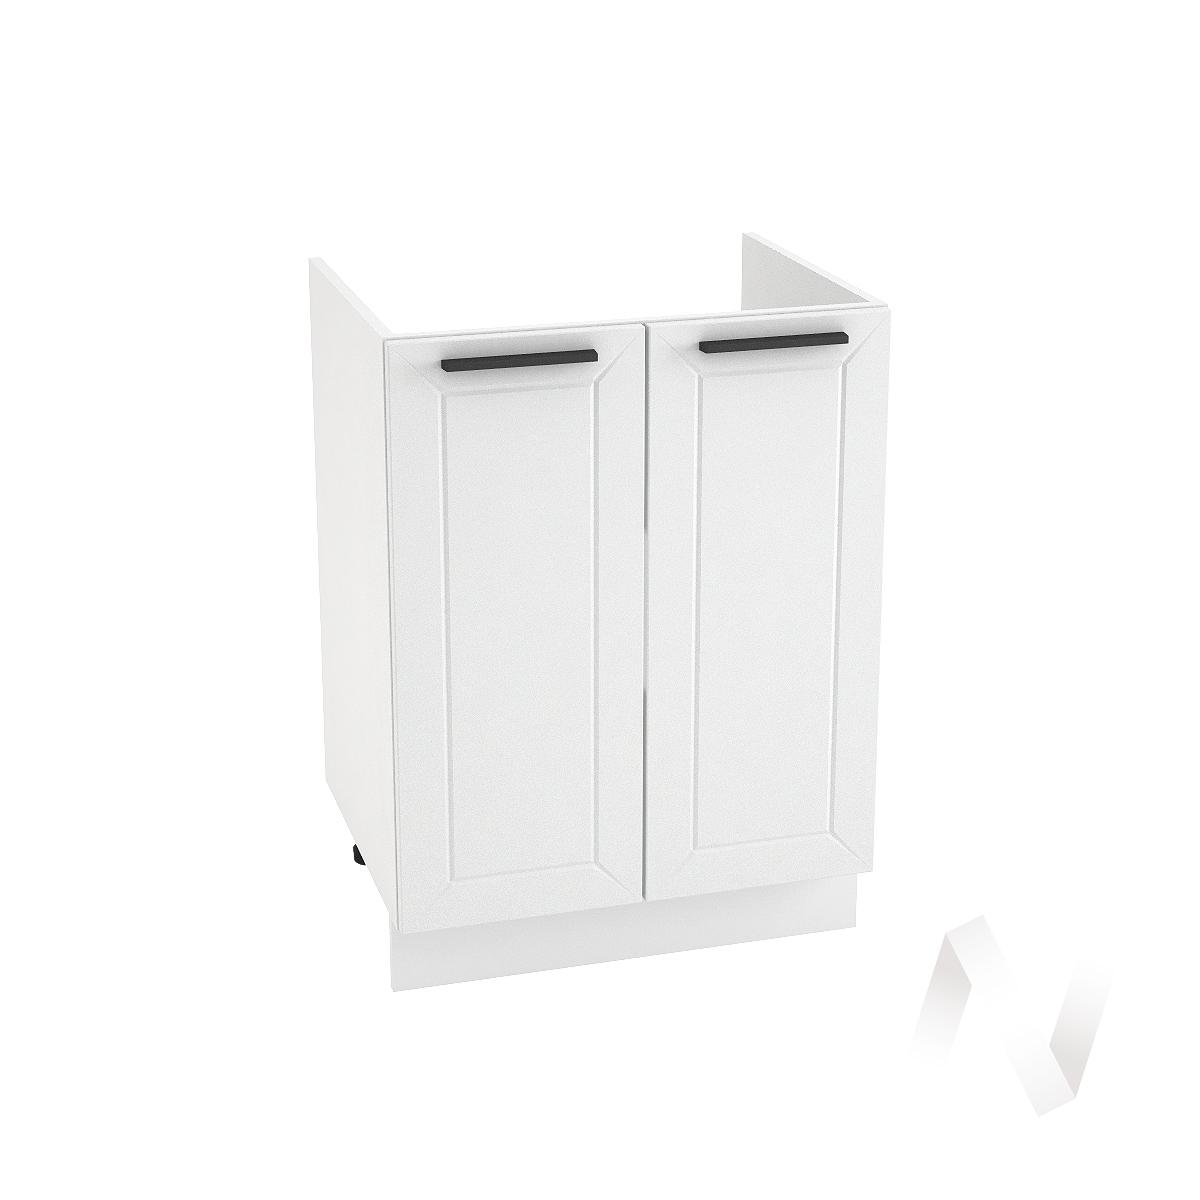 "Кухня ""Глетчер"": Шкаф нижний под мойку 600, ШНМ 600 (Айленд Силк/корпус белый)"